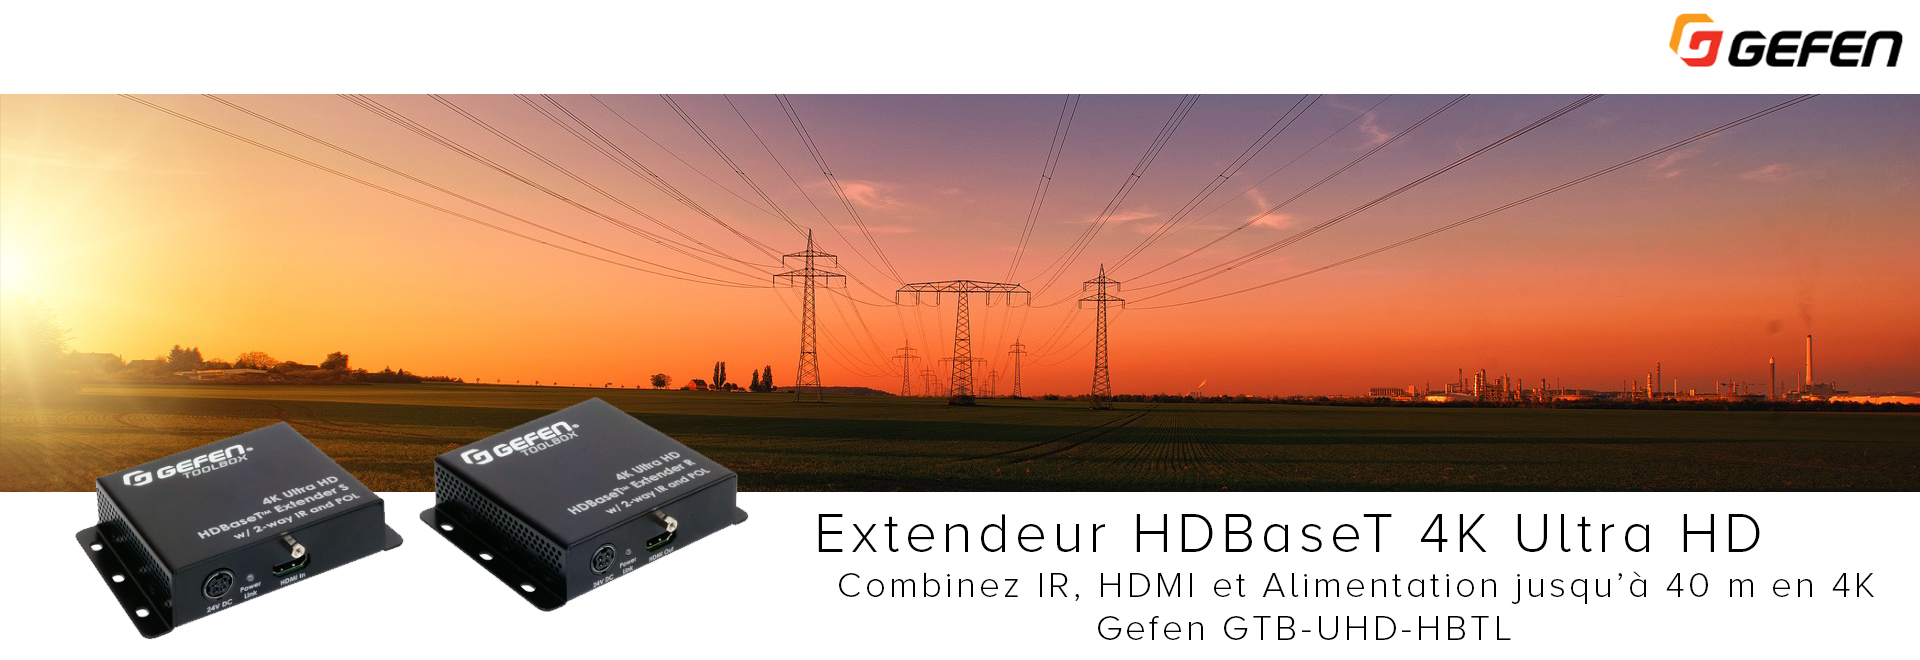 Extendeur HDBaseT Gefen